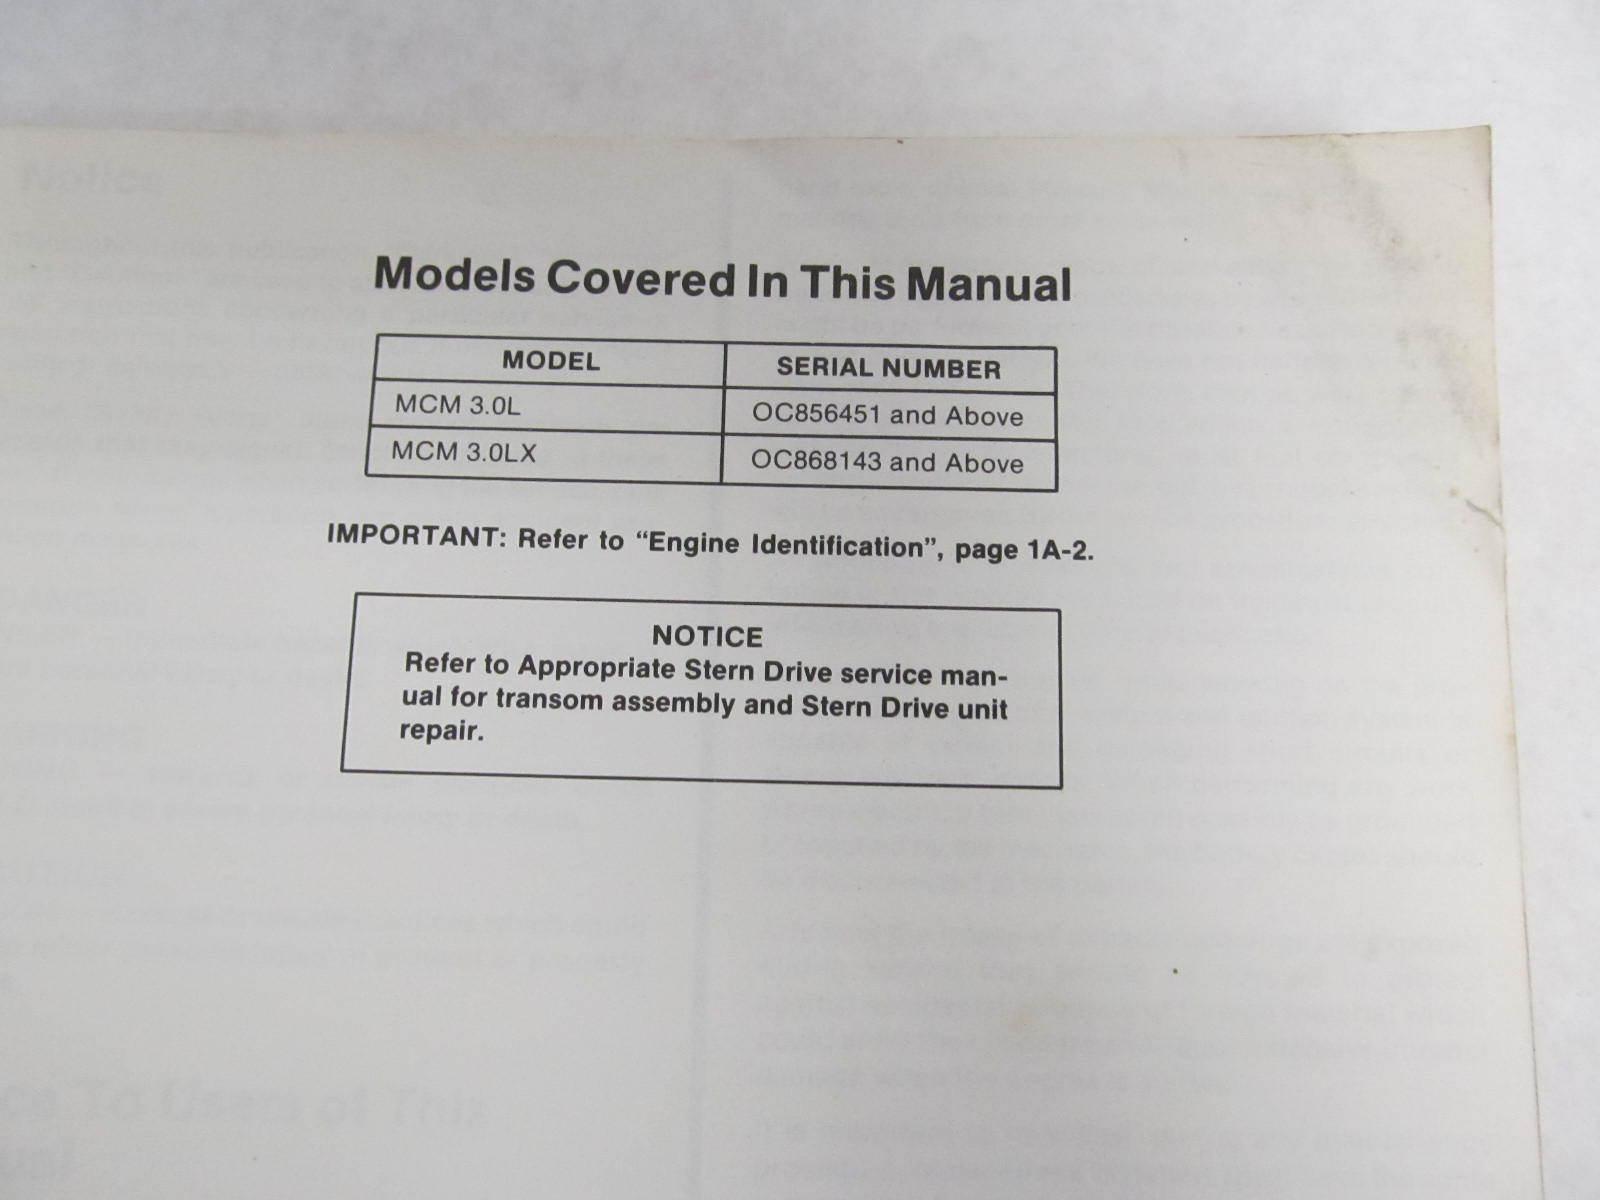 Mercruiser 3 0lx manual